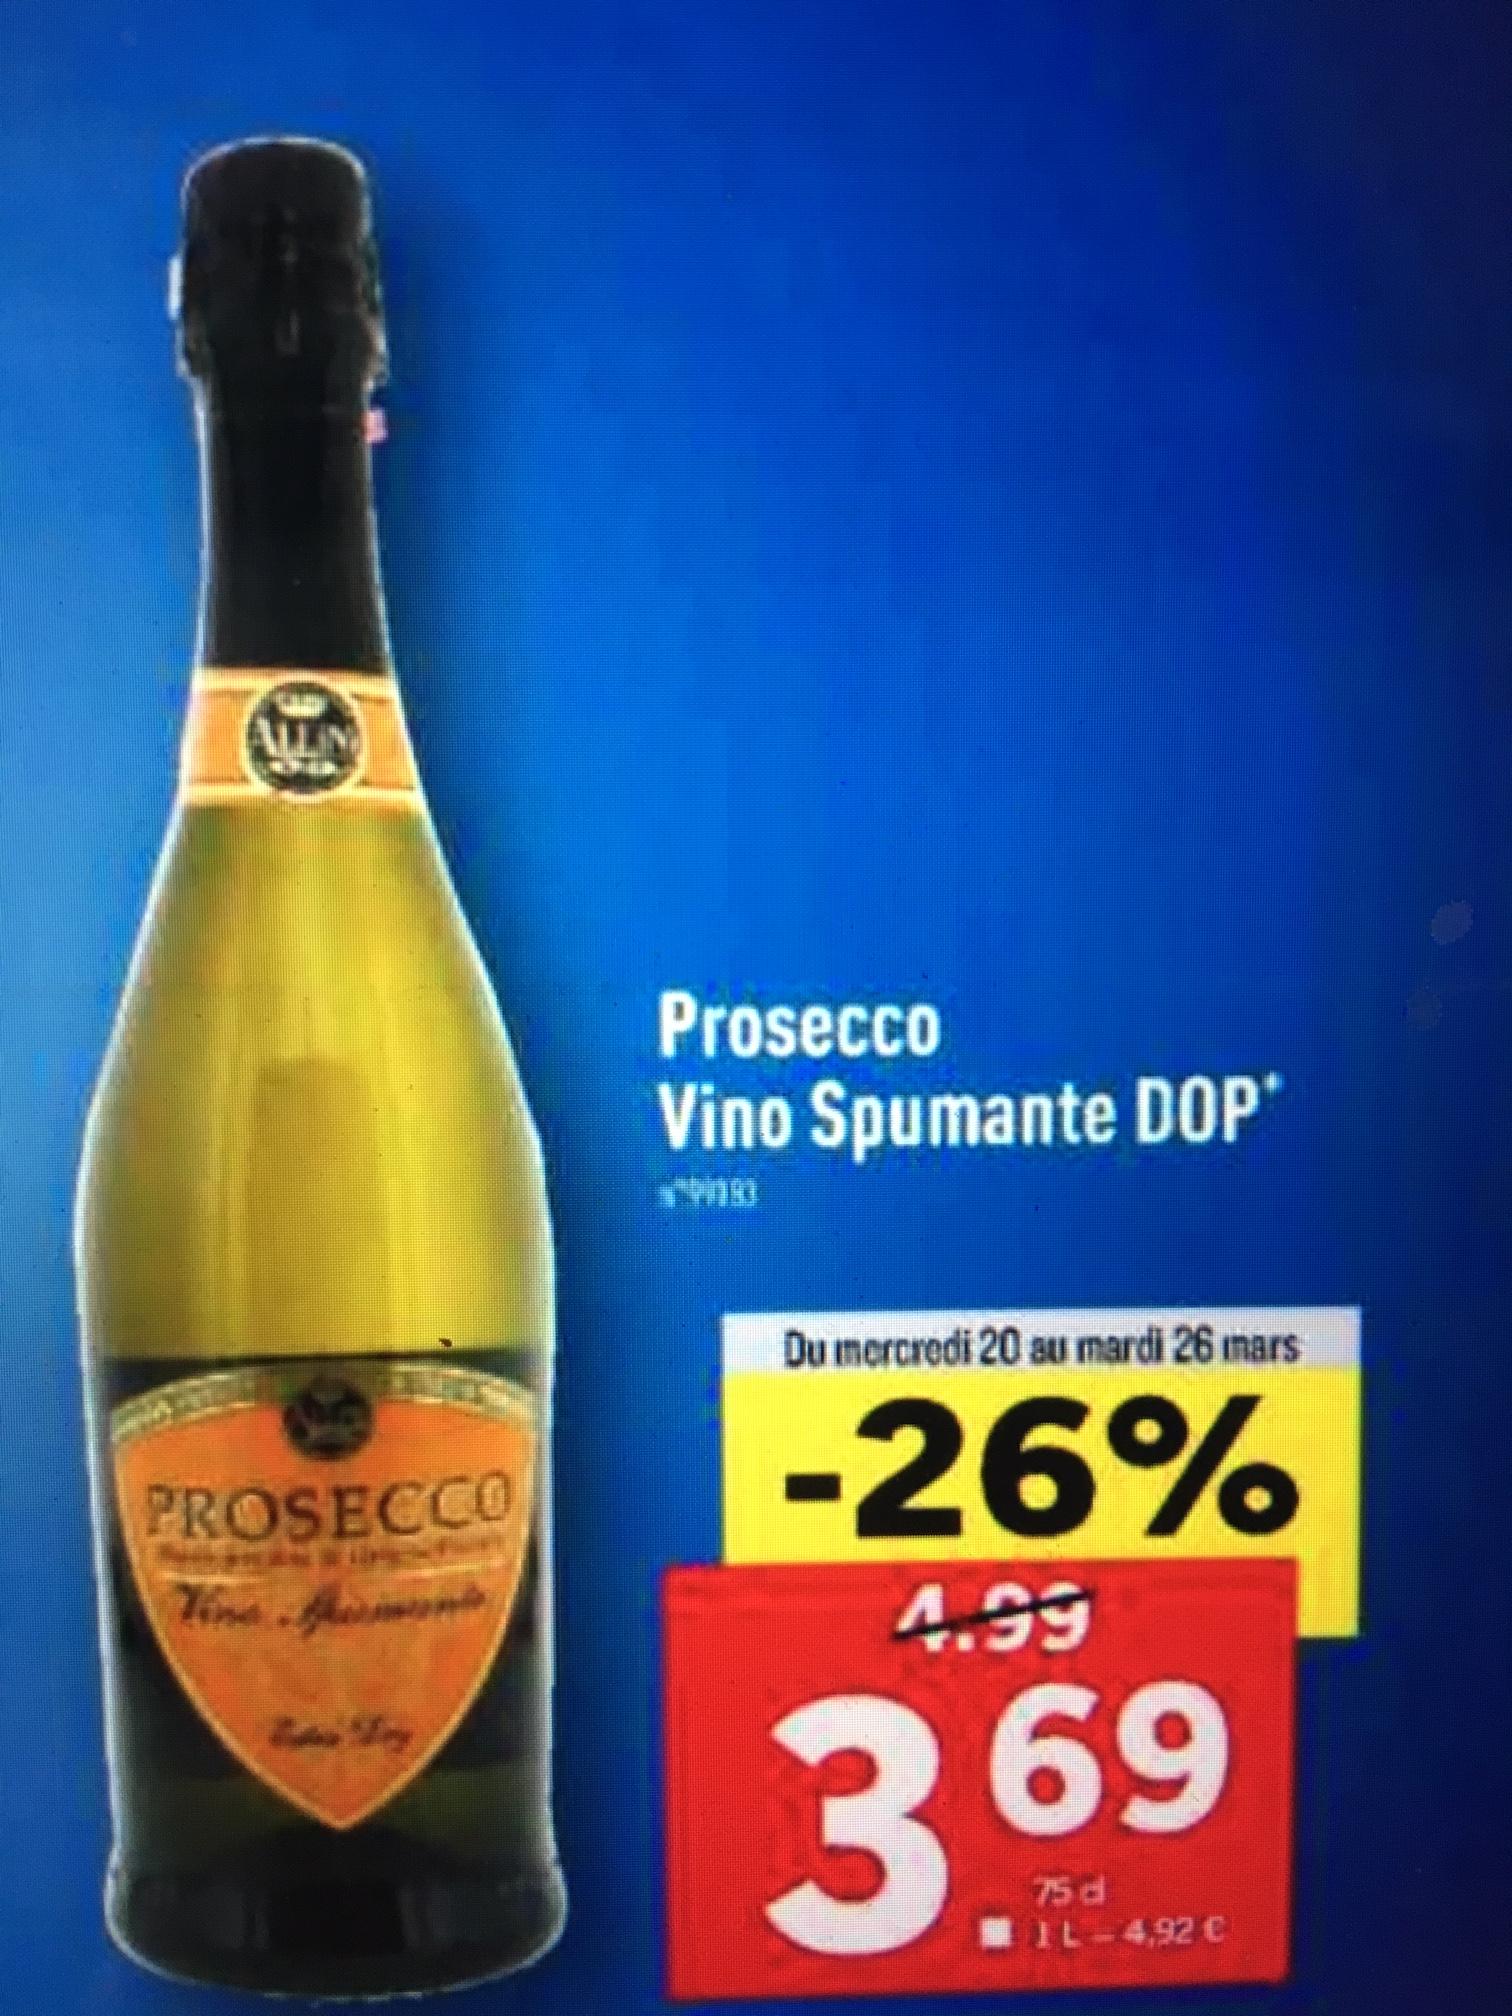 1 Bouteille de Prosecco Vino Spumante DOP - 75cl